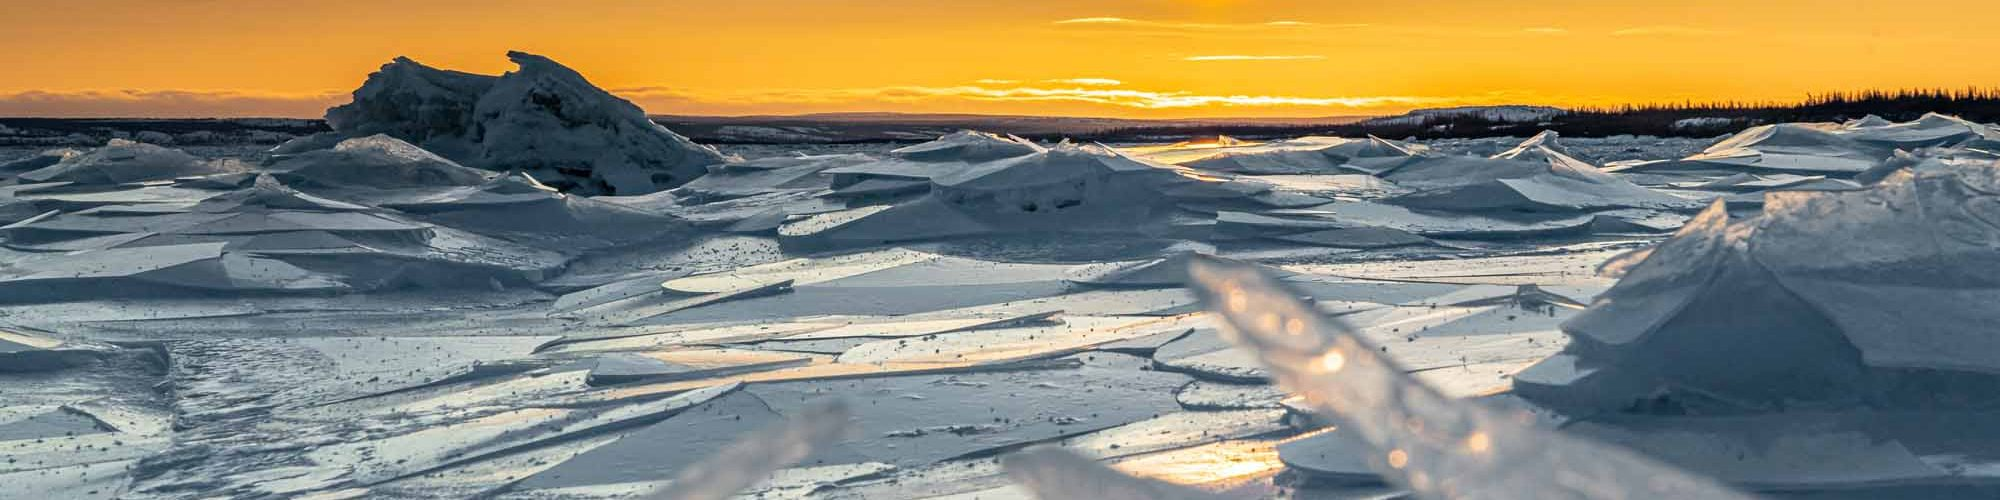 Arctique-quebecois-Lecons-de-Kuujjuaq-Quebecs-Arctic-Daniel-Keith-Cooper-NUNAVIK-2020-ice-sunset